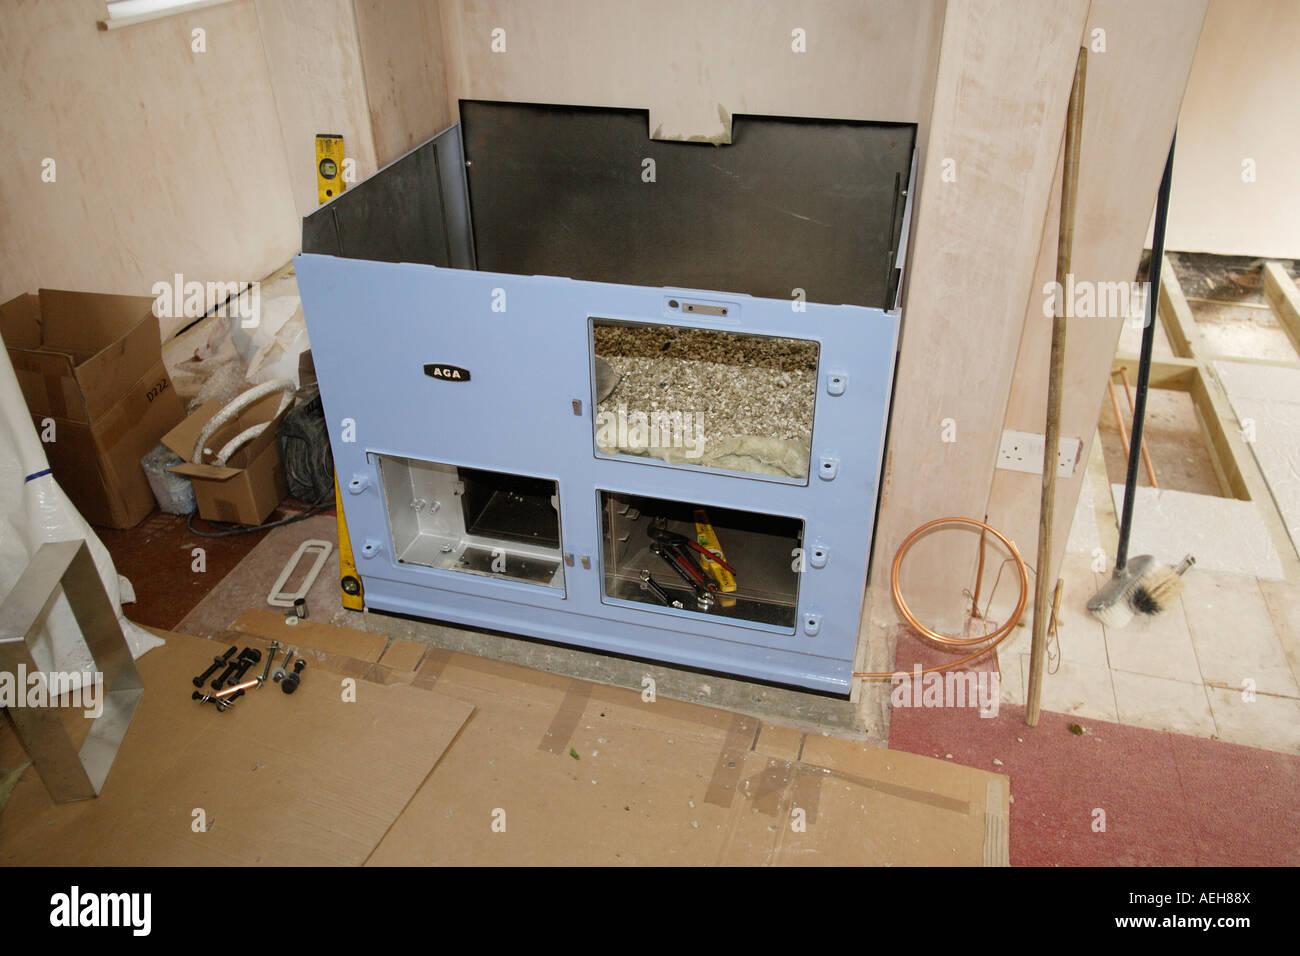 Aga Cooker Stock Photos & Aga Cooker Stock Images - Alamy